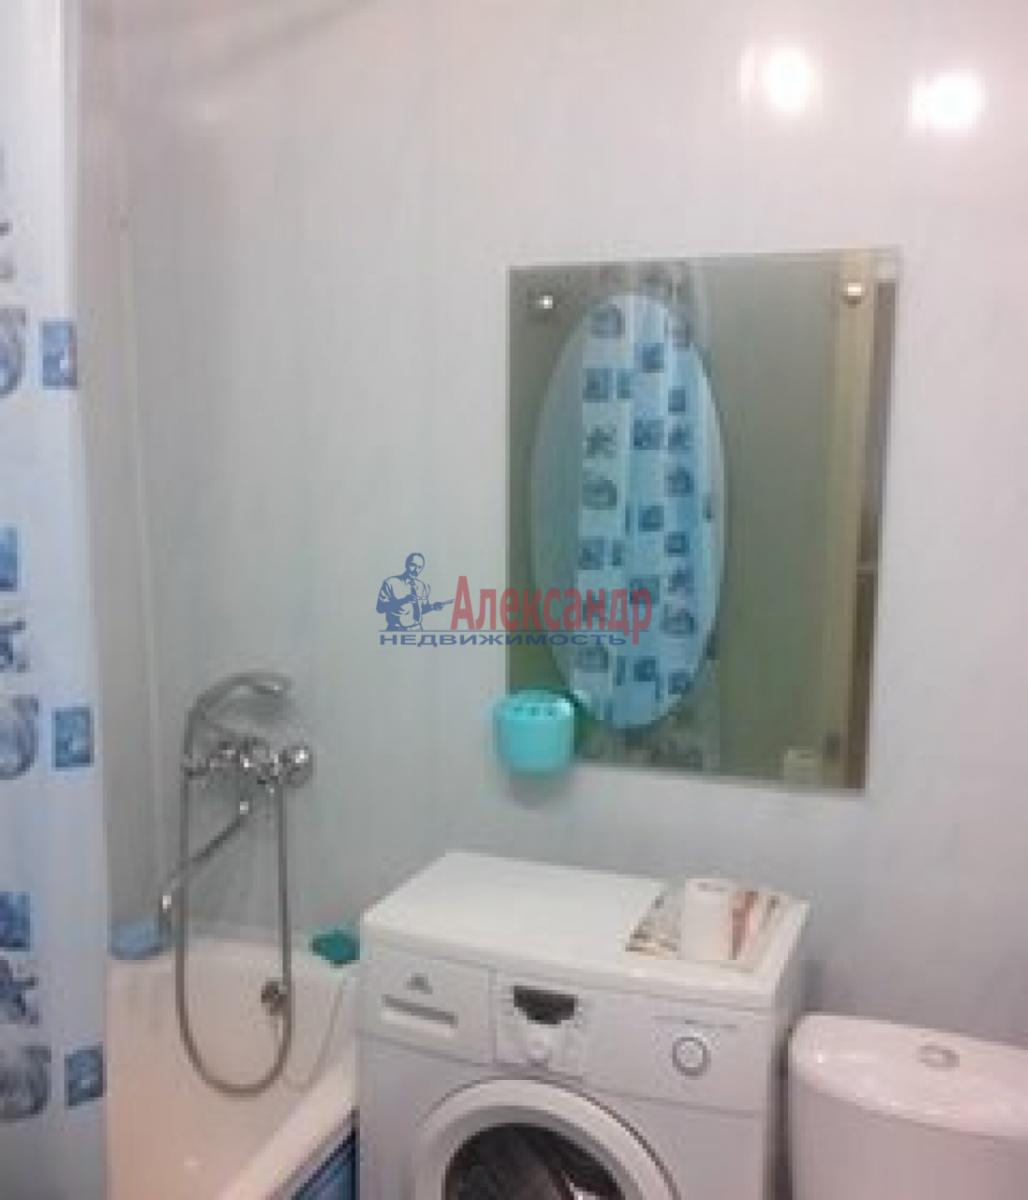 1-комнатная квартира (39м2) в аренду по адресу Ленинский пр., 75— фото 6 из 6